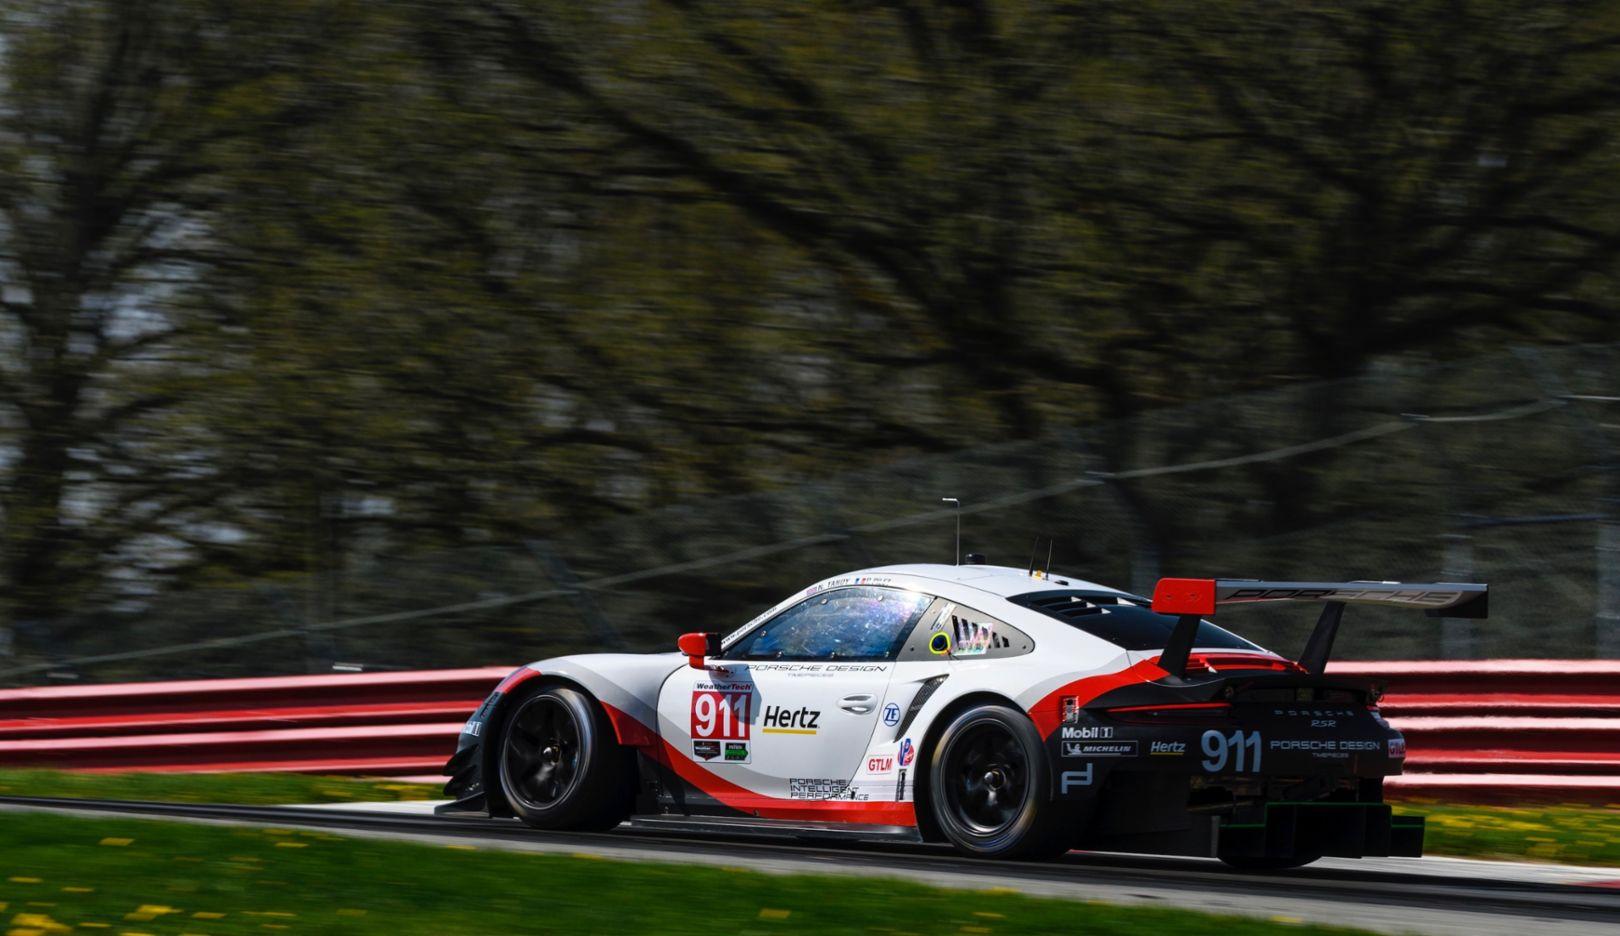 911 RSR, IMSA WeatherTech SportsCar Championship, Mid-Ohio, 2018, Porsche AG